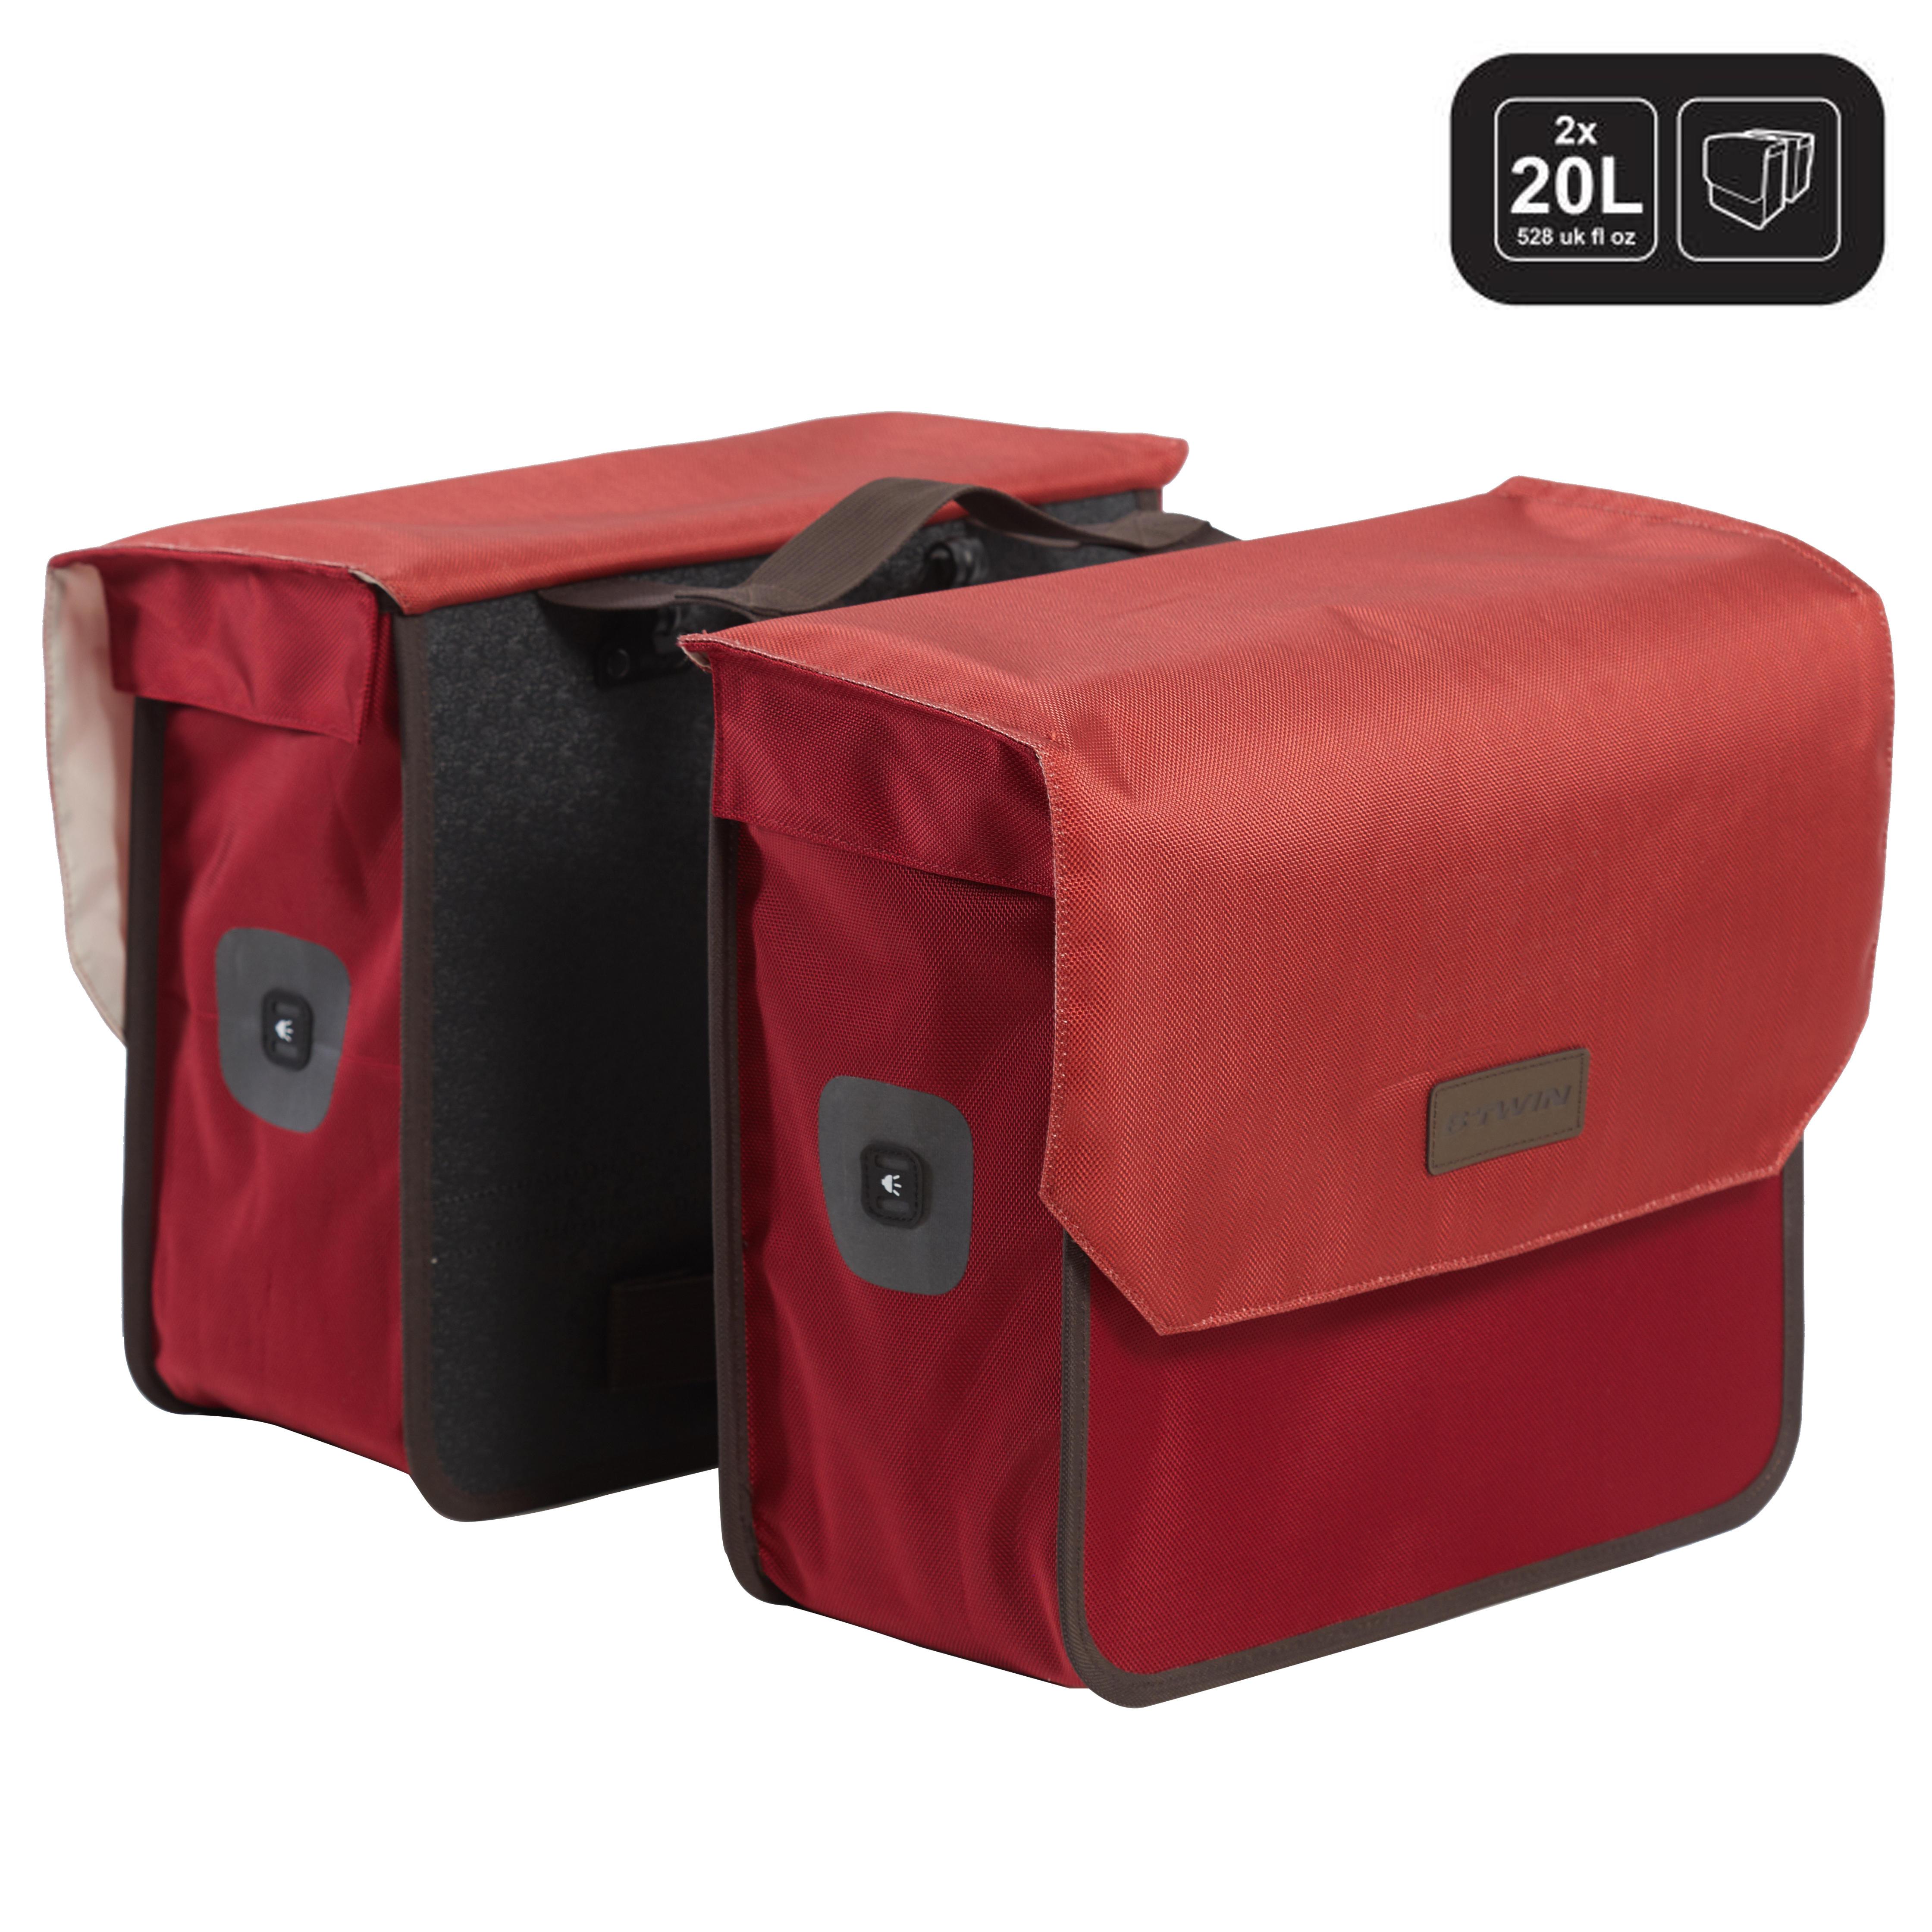 Doppel-Fahrradtasche 520 2×20 l bordeauxrot | Taschen > Businesstaschen > Fahrrad-taschen Büro | Elops